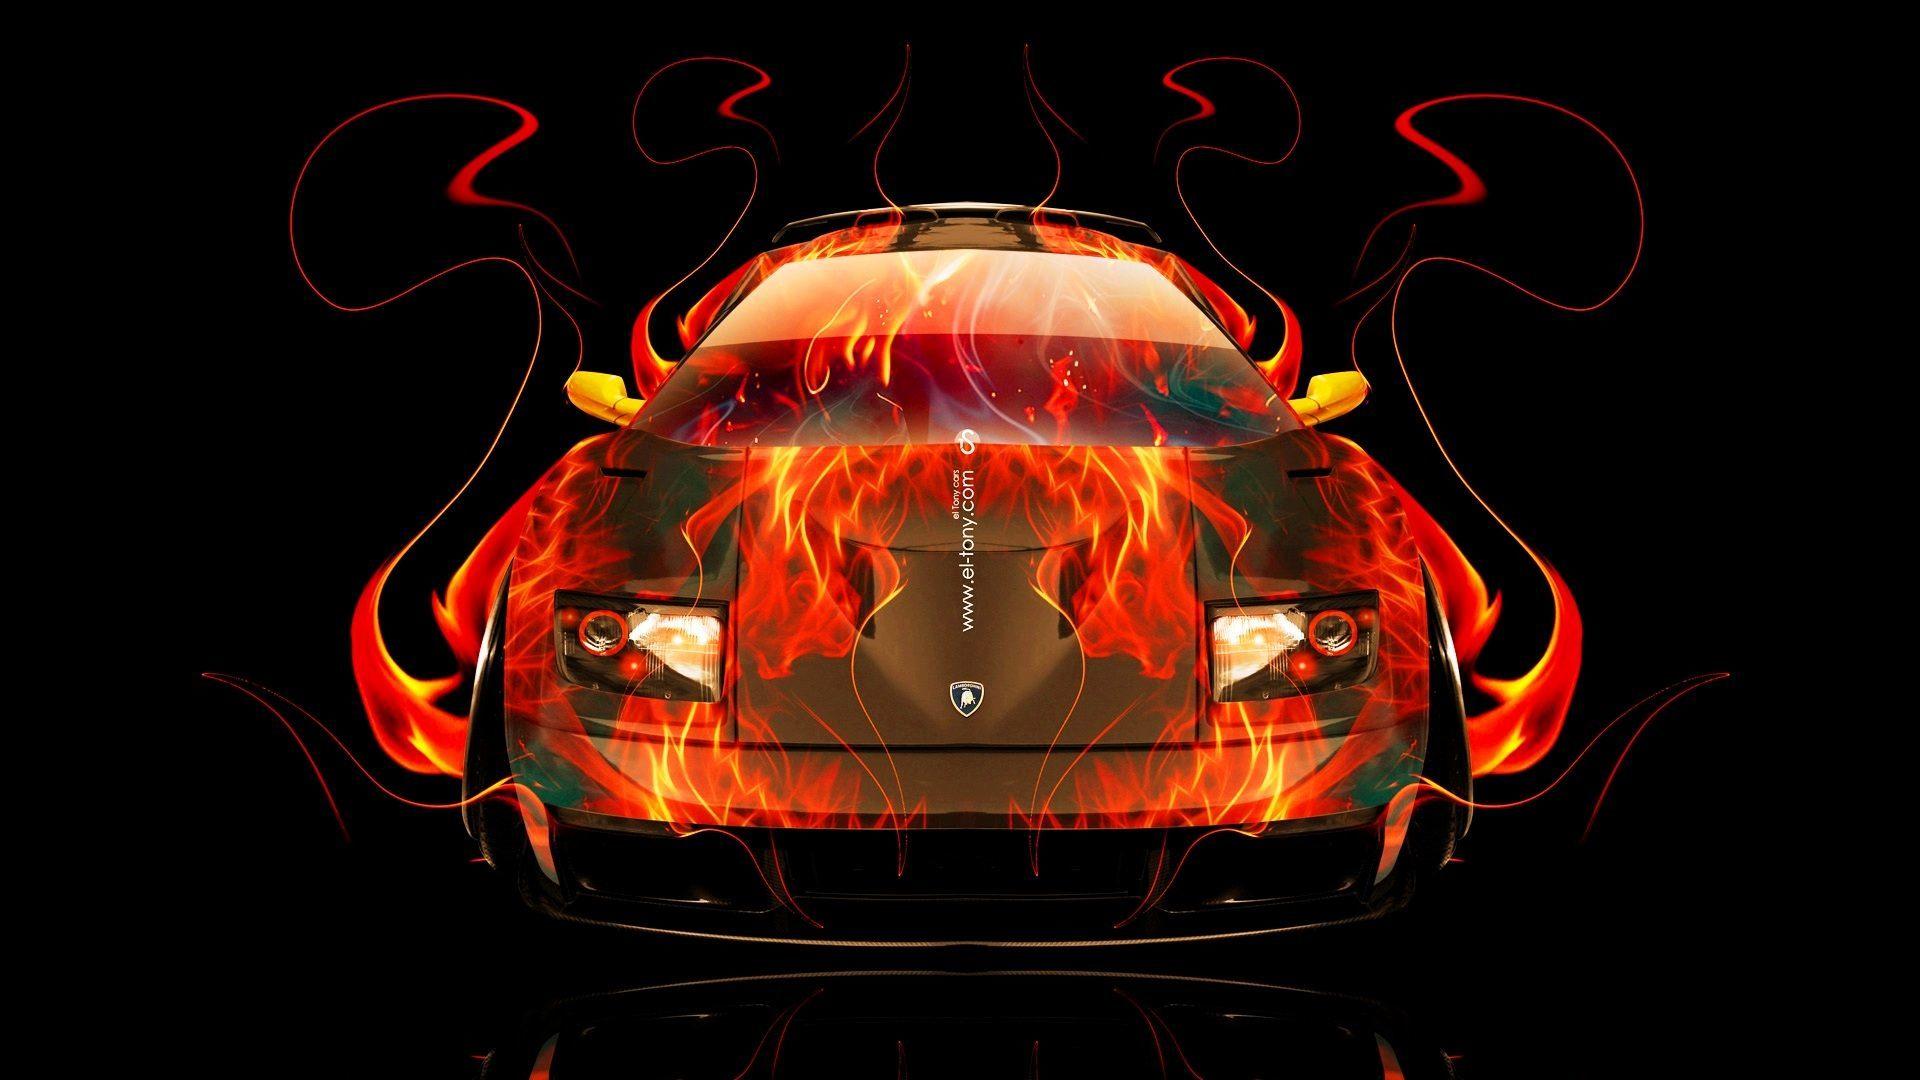 Design Talent Showcase El Tony Com Brings Sensual Elements Fire And Water To Your Car Wallpapers